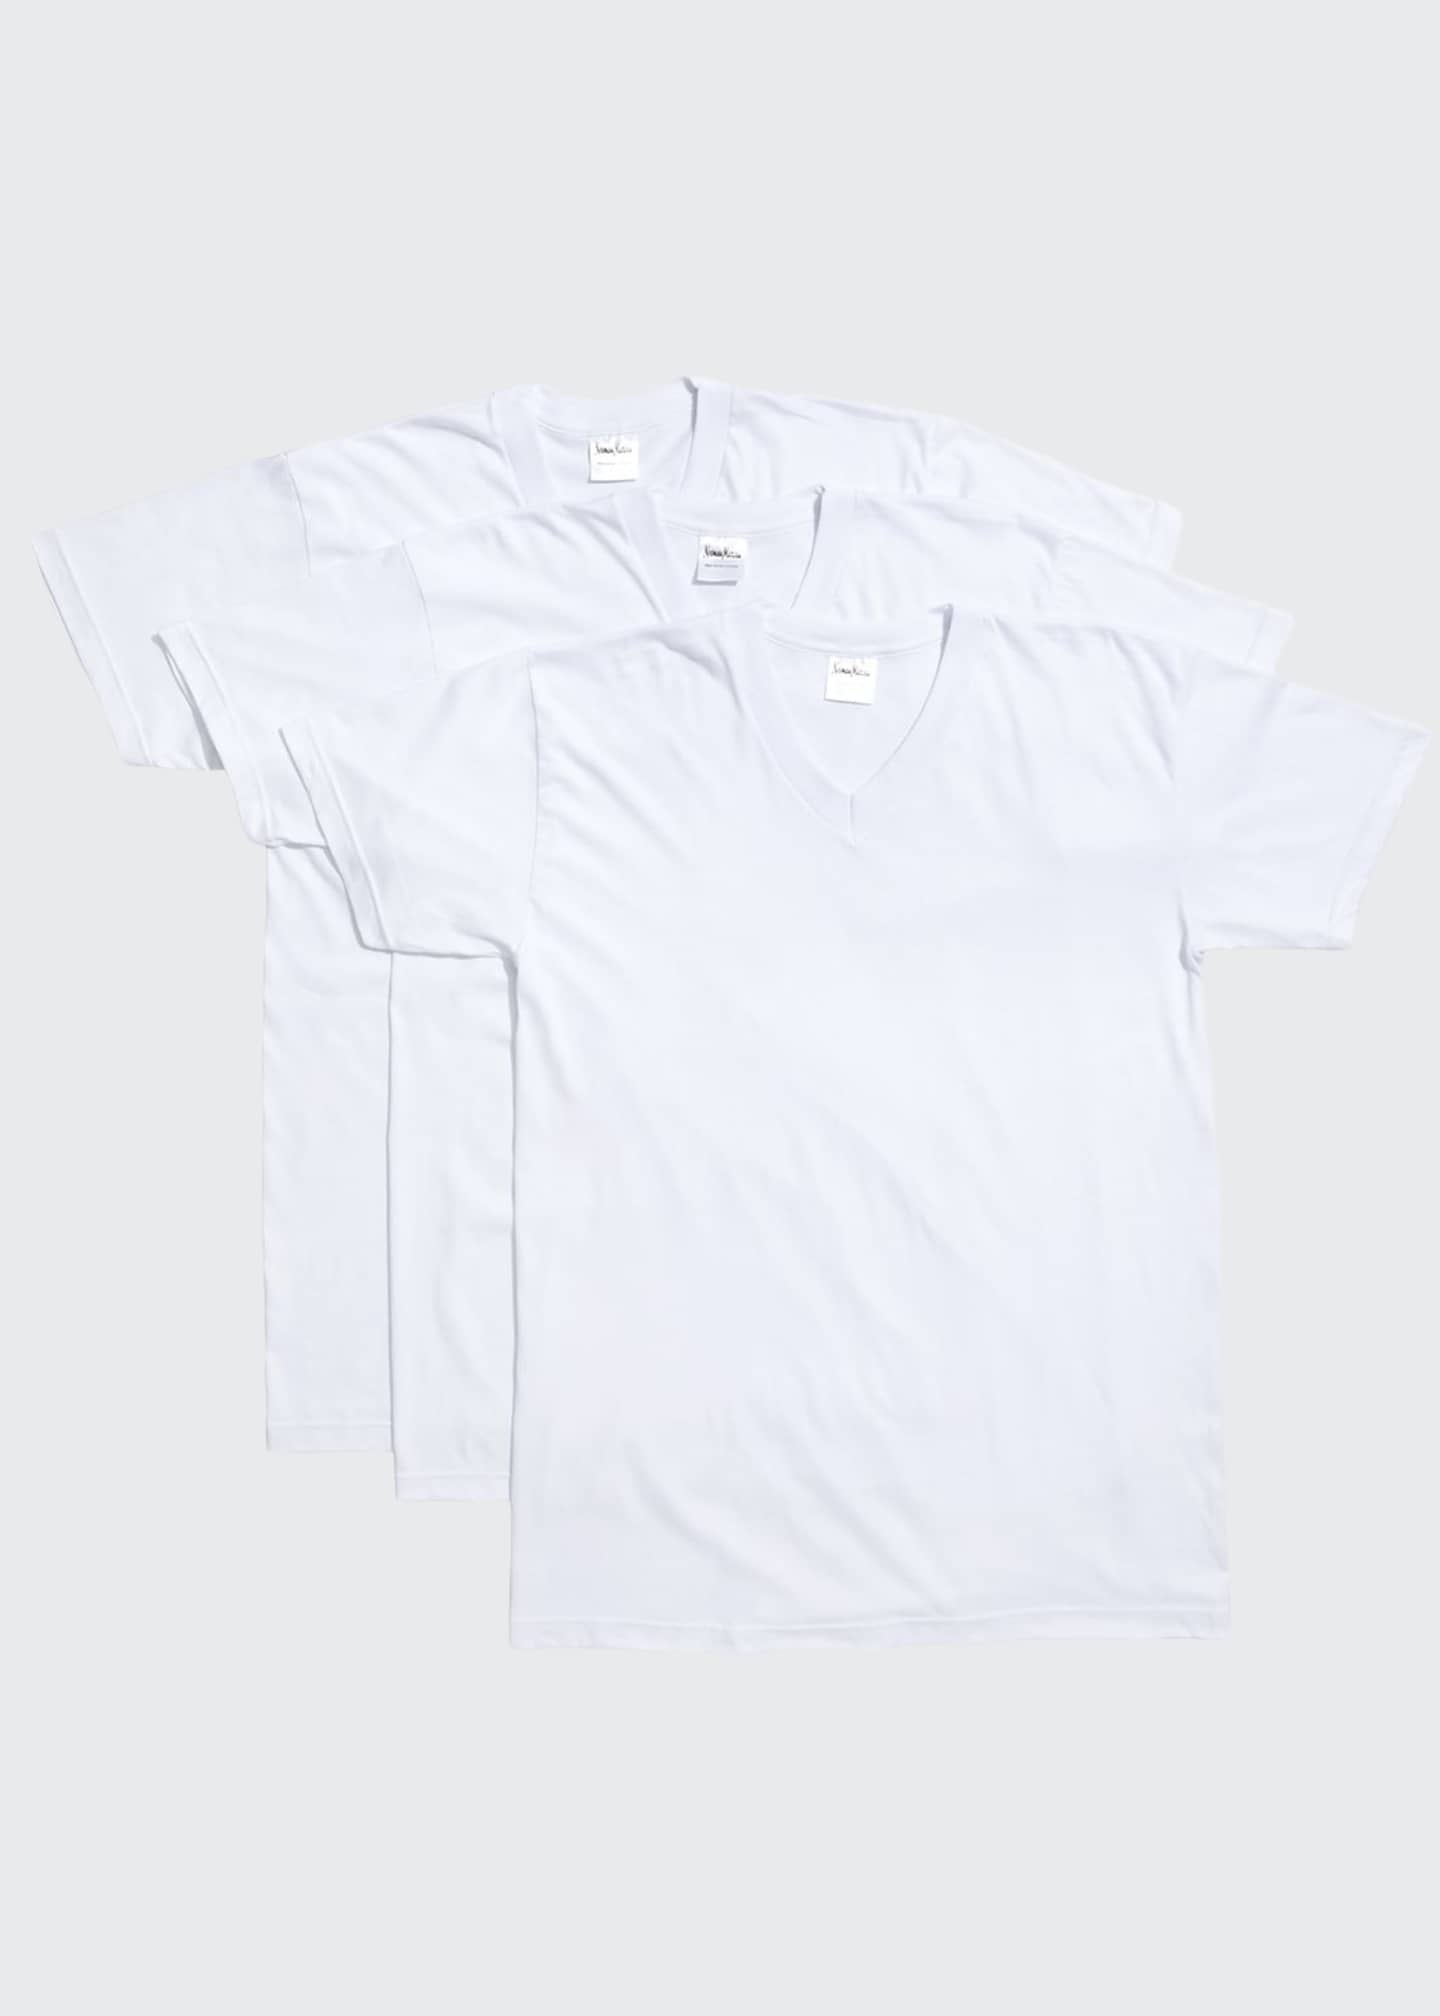 Neiman Marcus Men's 3-Pack Cotton Stretch T-Shirts